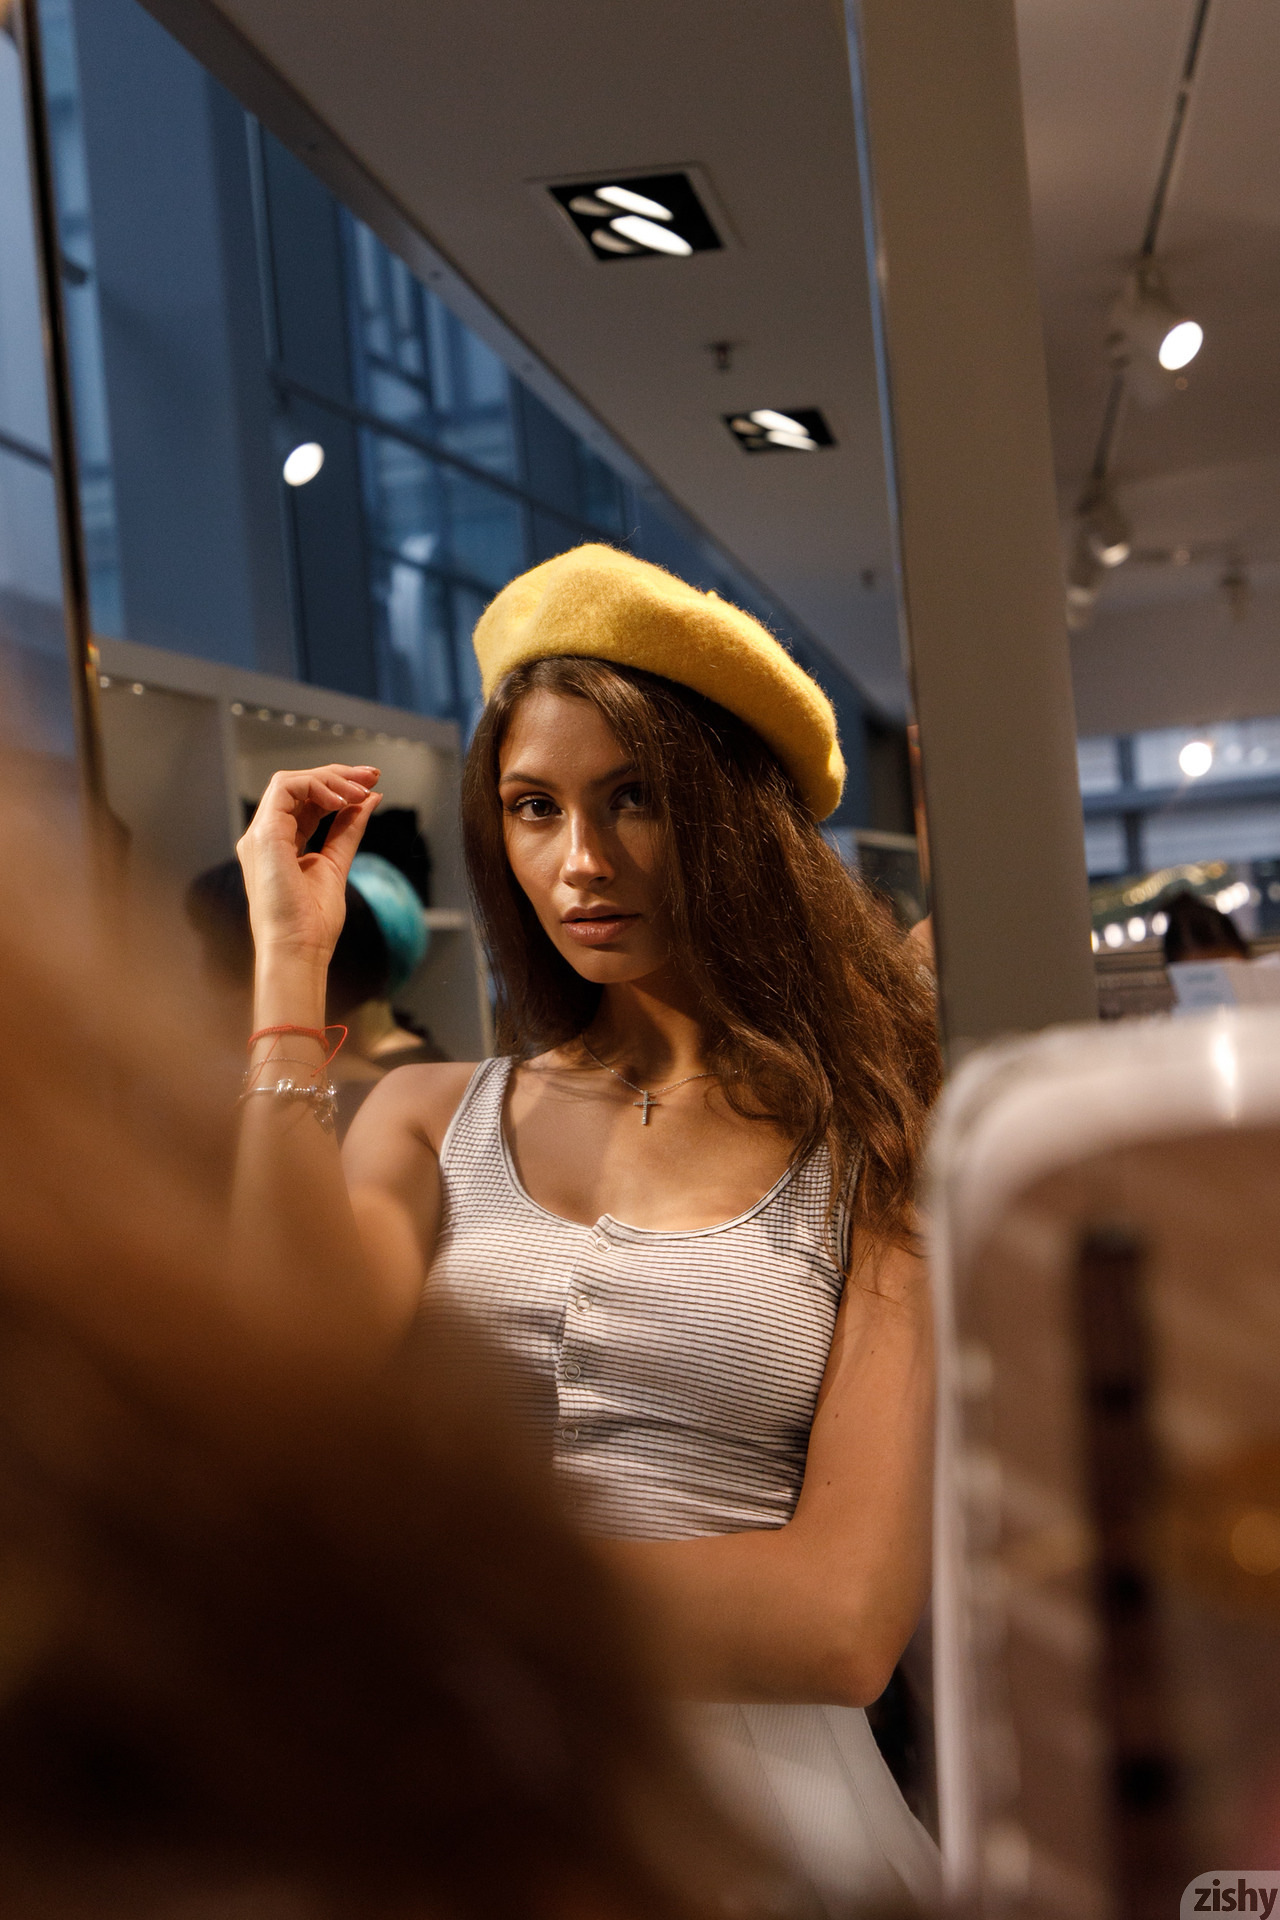 Shyla Volbeck Shopping With The Devil Zishy (11)